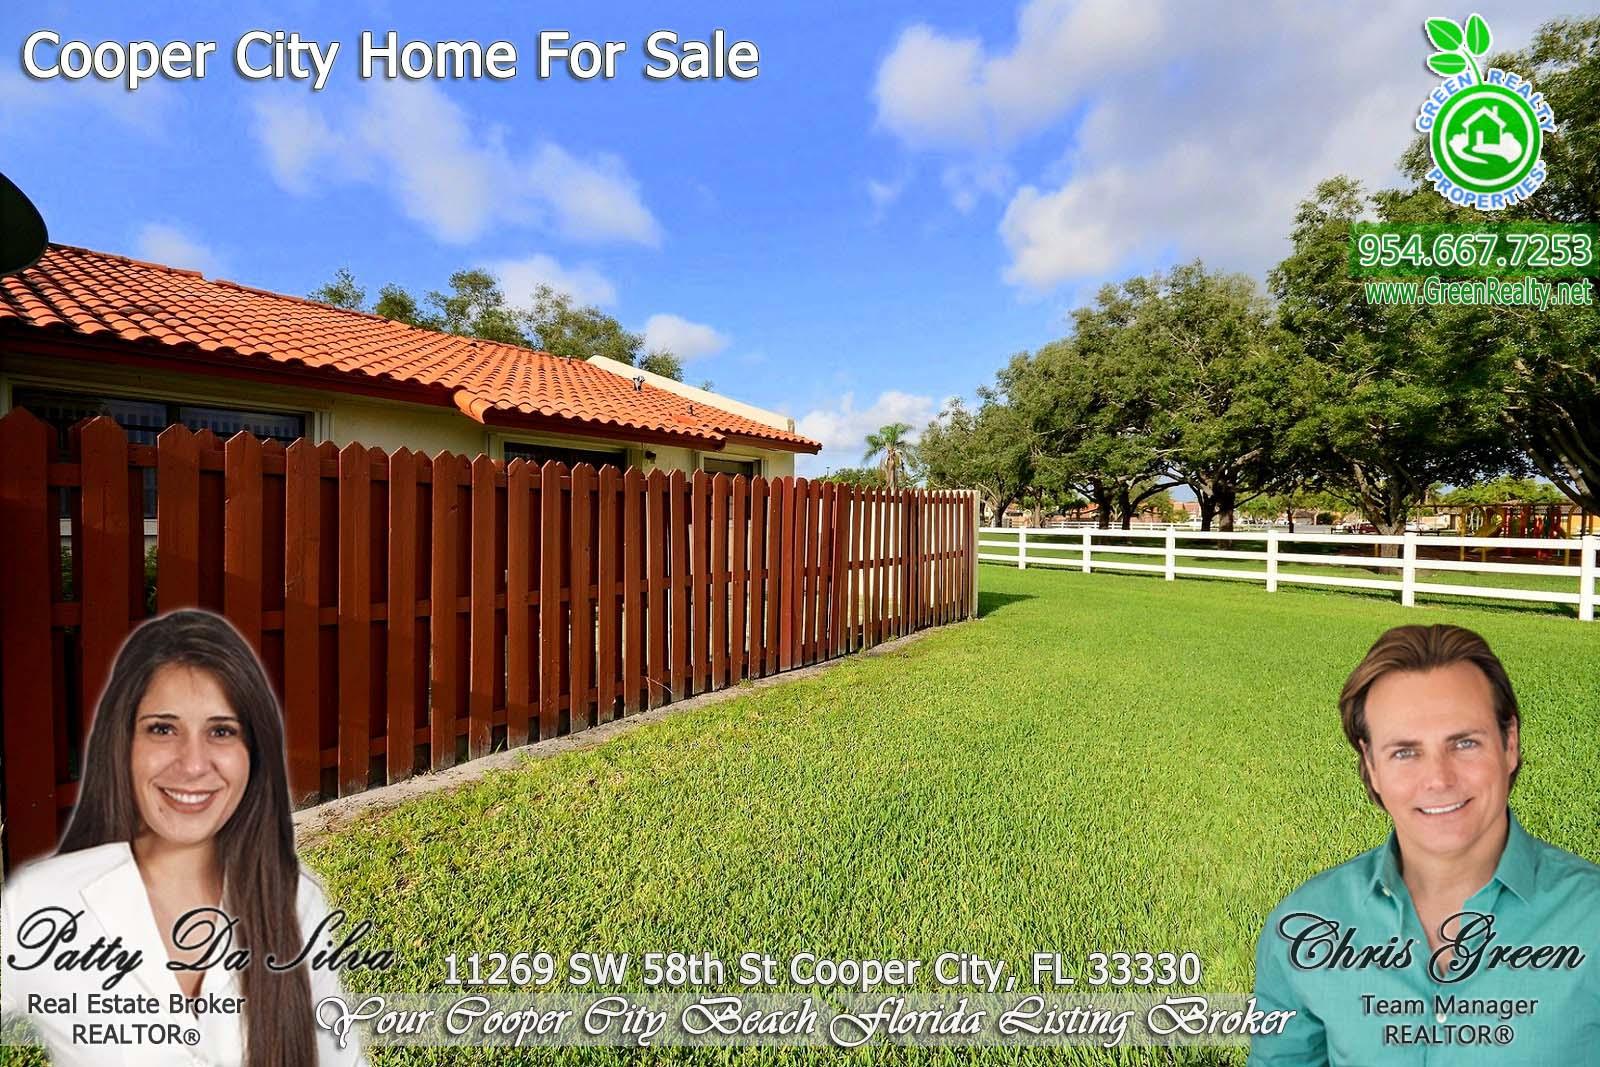 22 Cooper City Real Estate - Villas (3)